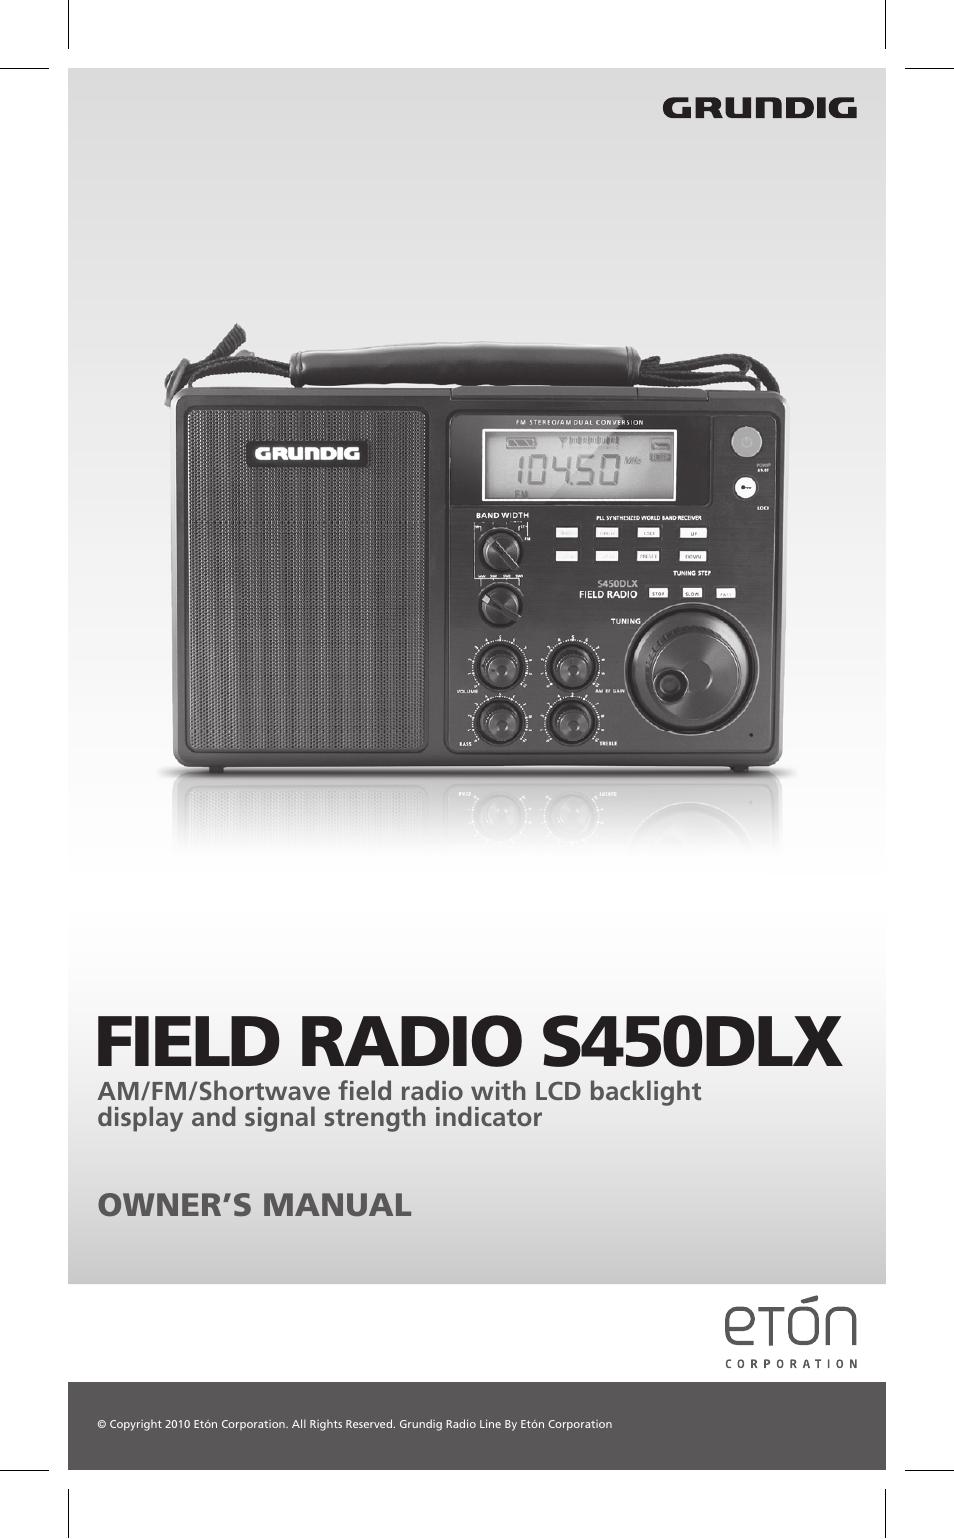 Eton Corporation Am Fm Shortwave Radio Manual Guide